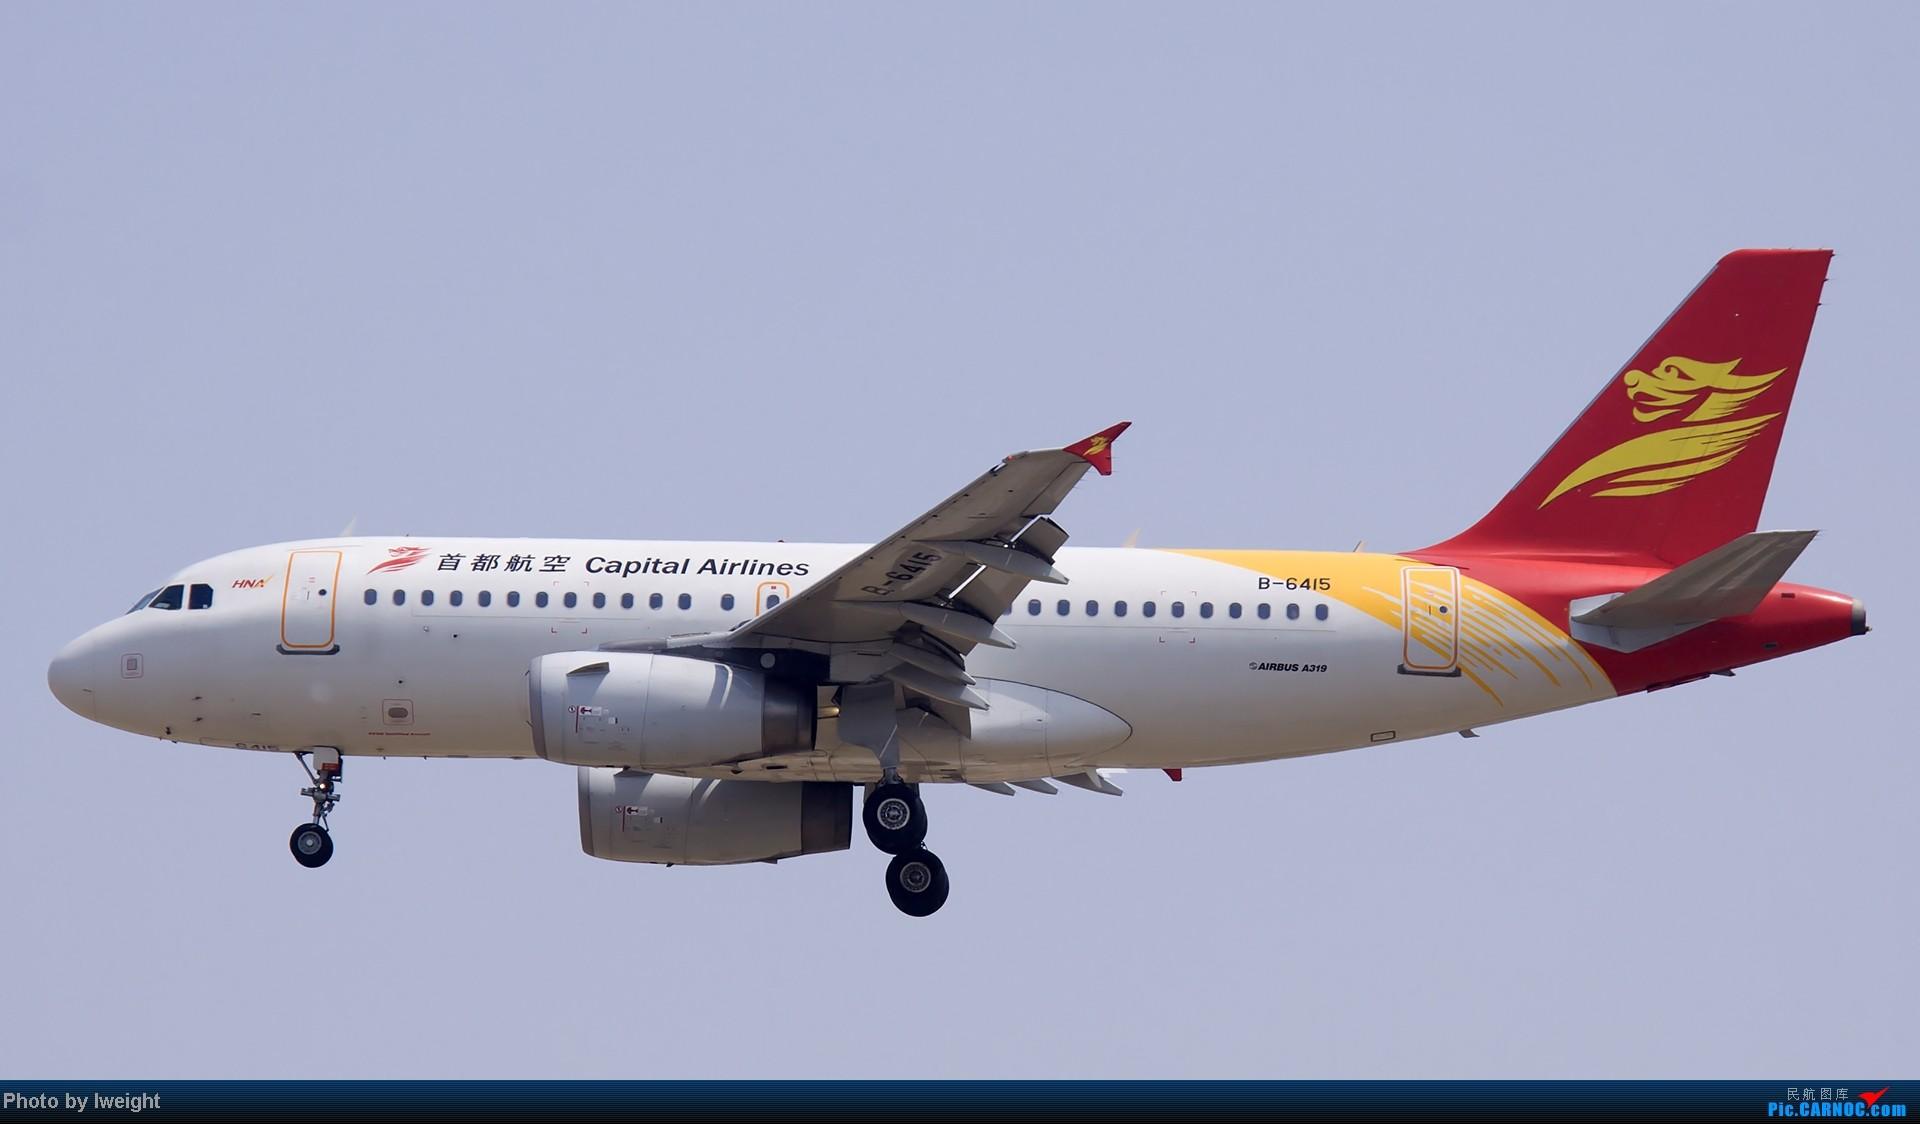 Re:[原创]错过了卡航的巴塞罗那号,只有这些大路货了,泪奔啊 AIRBUS A319-100 B-6415 中国北京首都机场